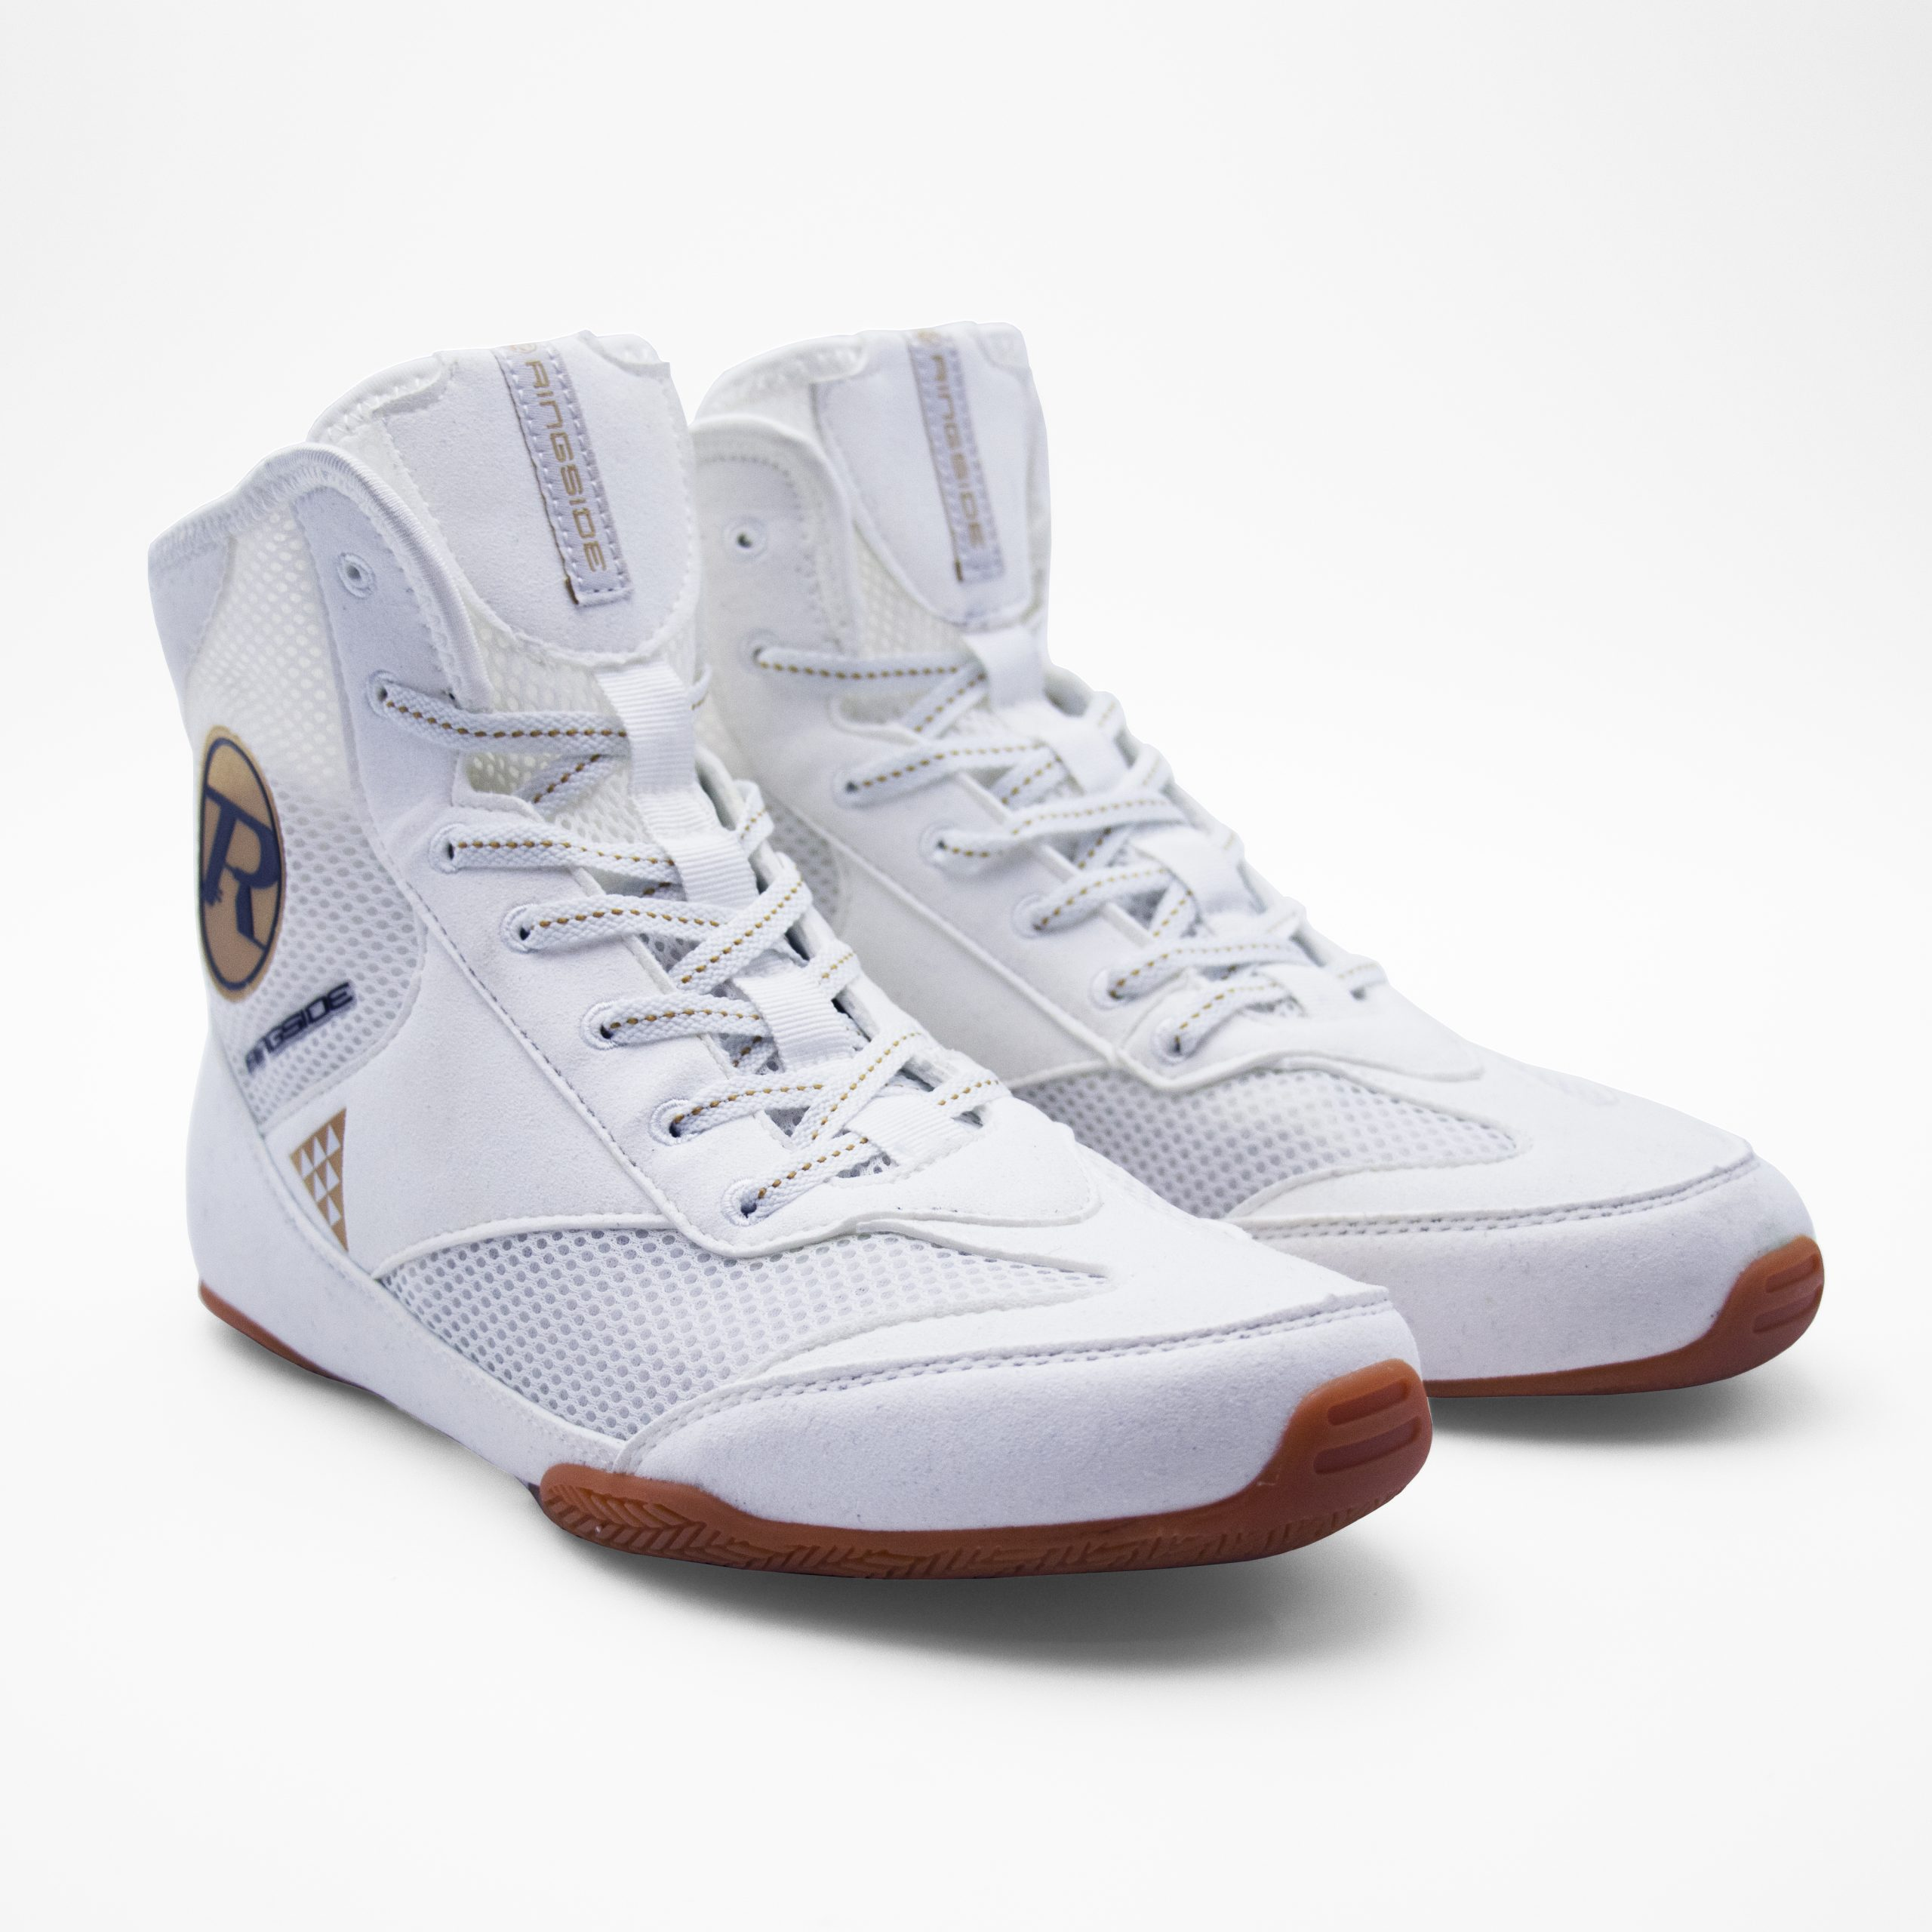 white-pair